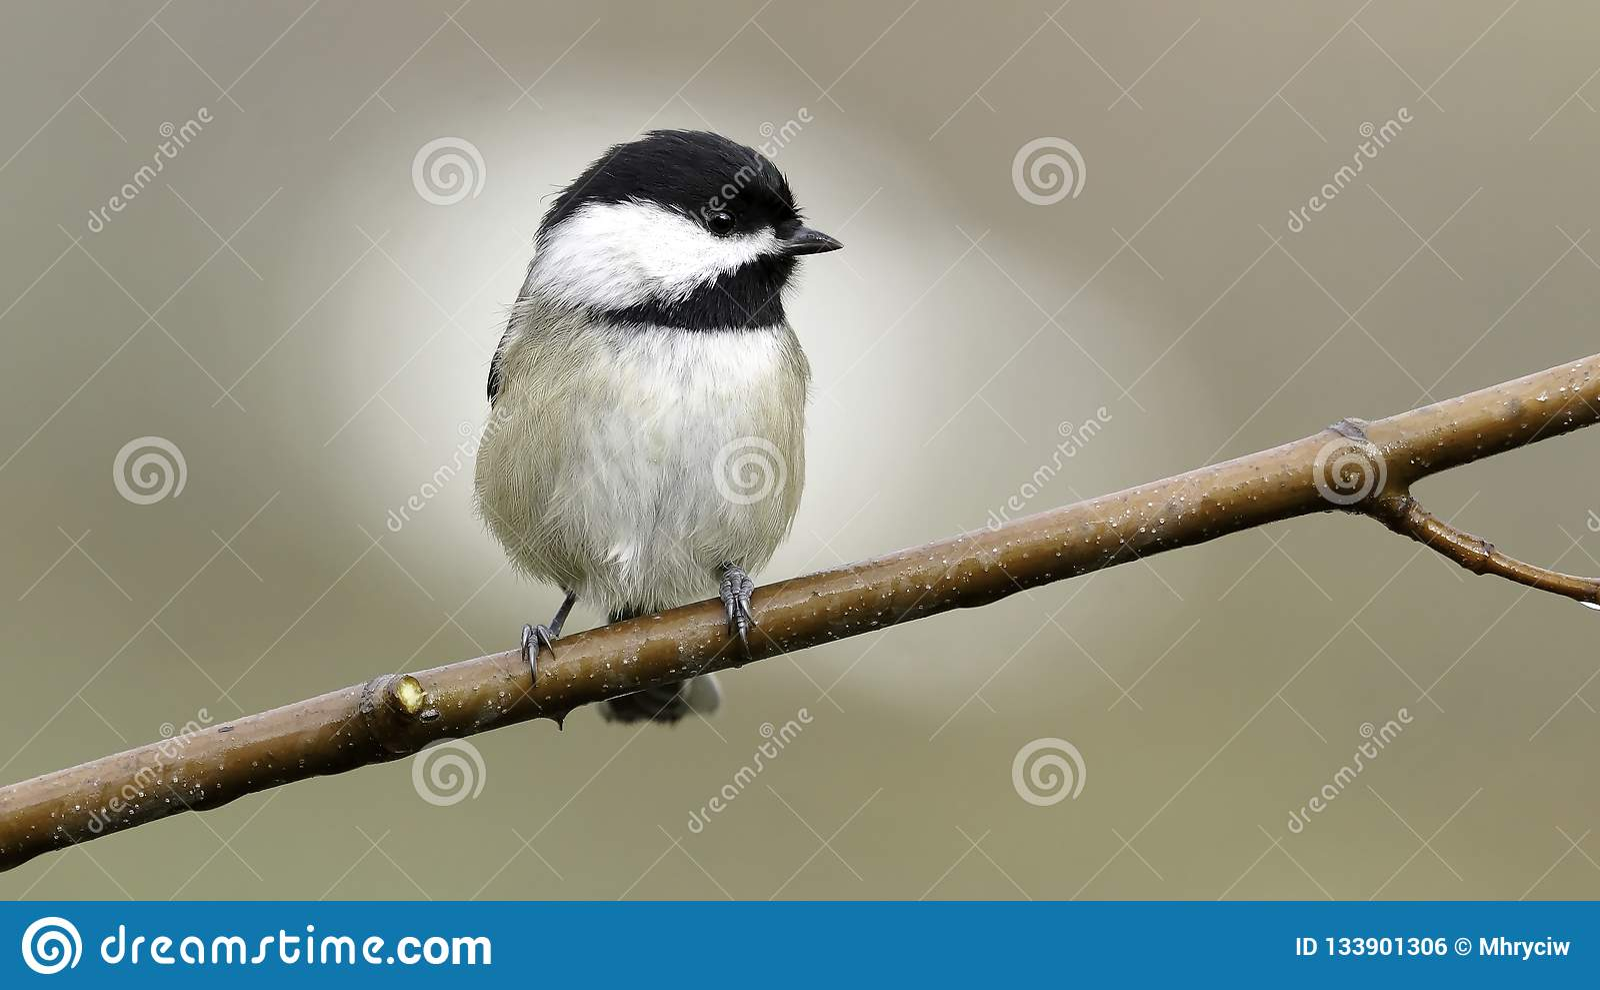 Chickadee Alone on A Branch Small Bird